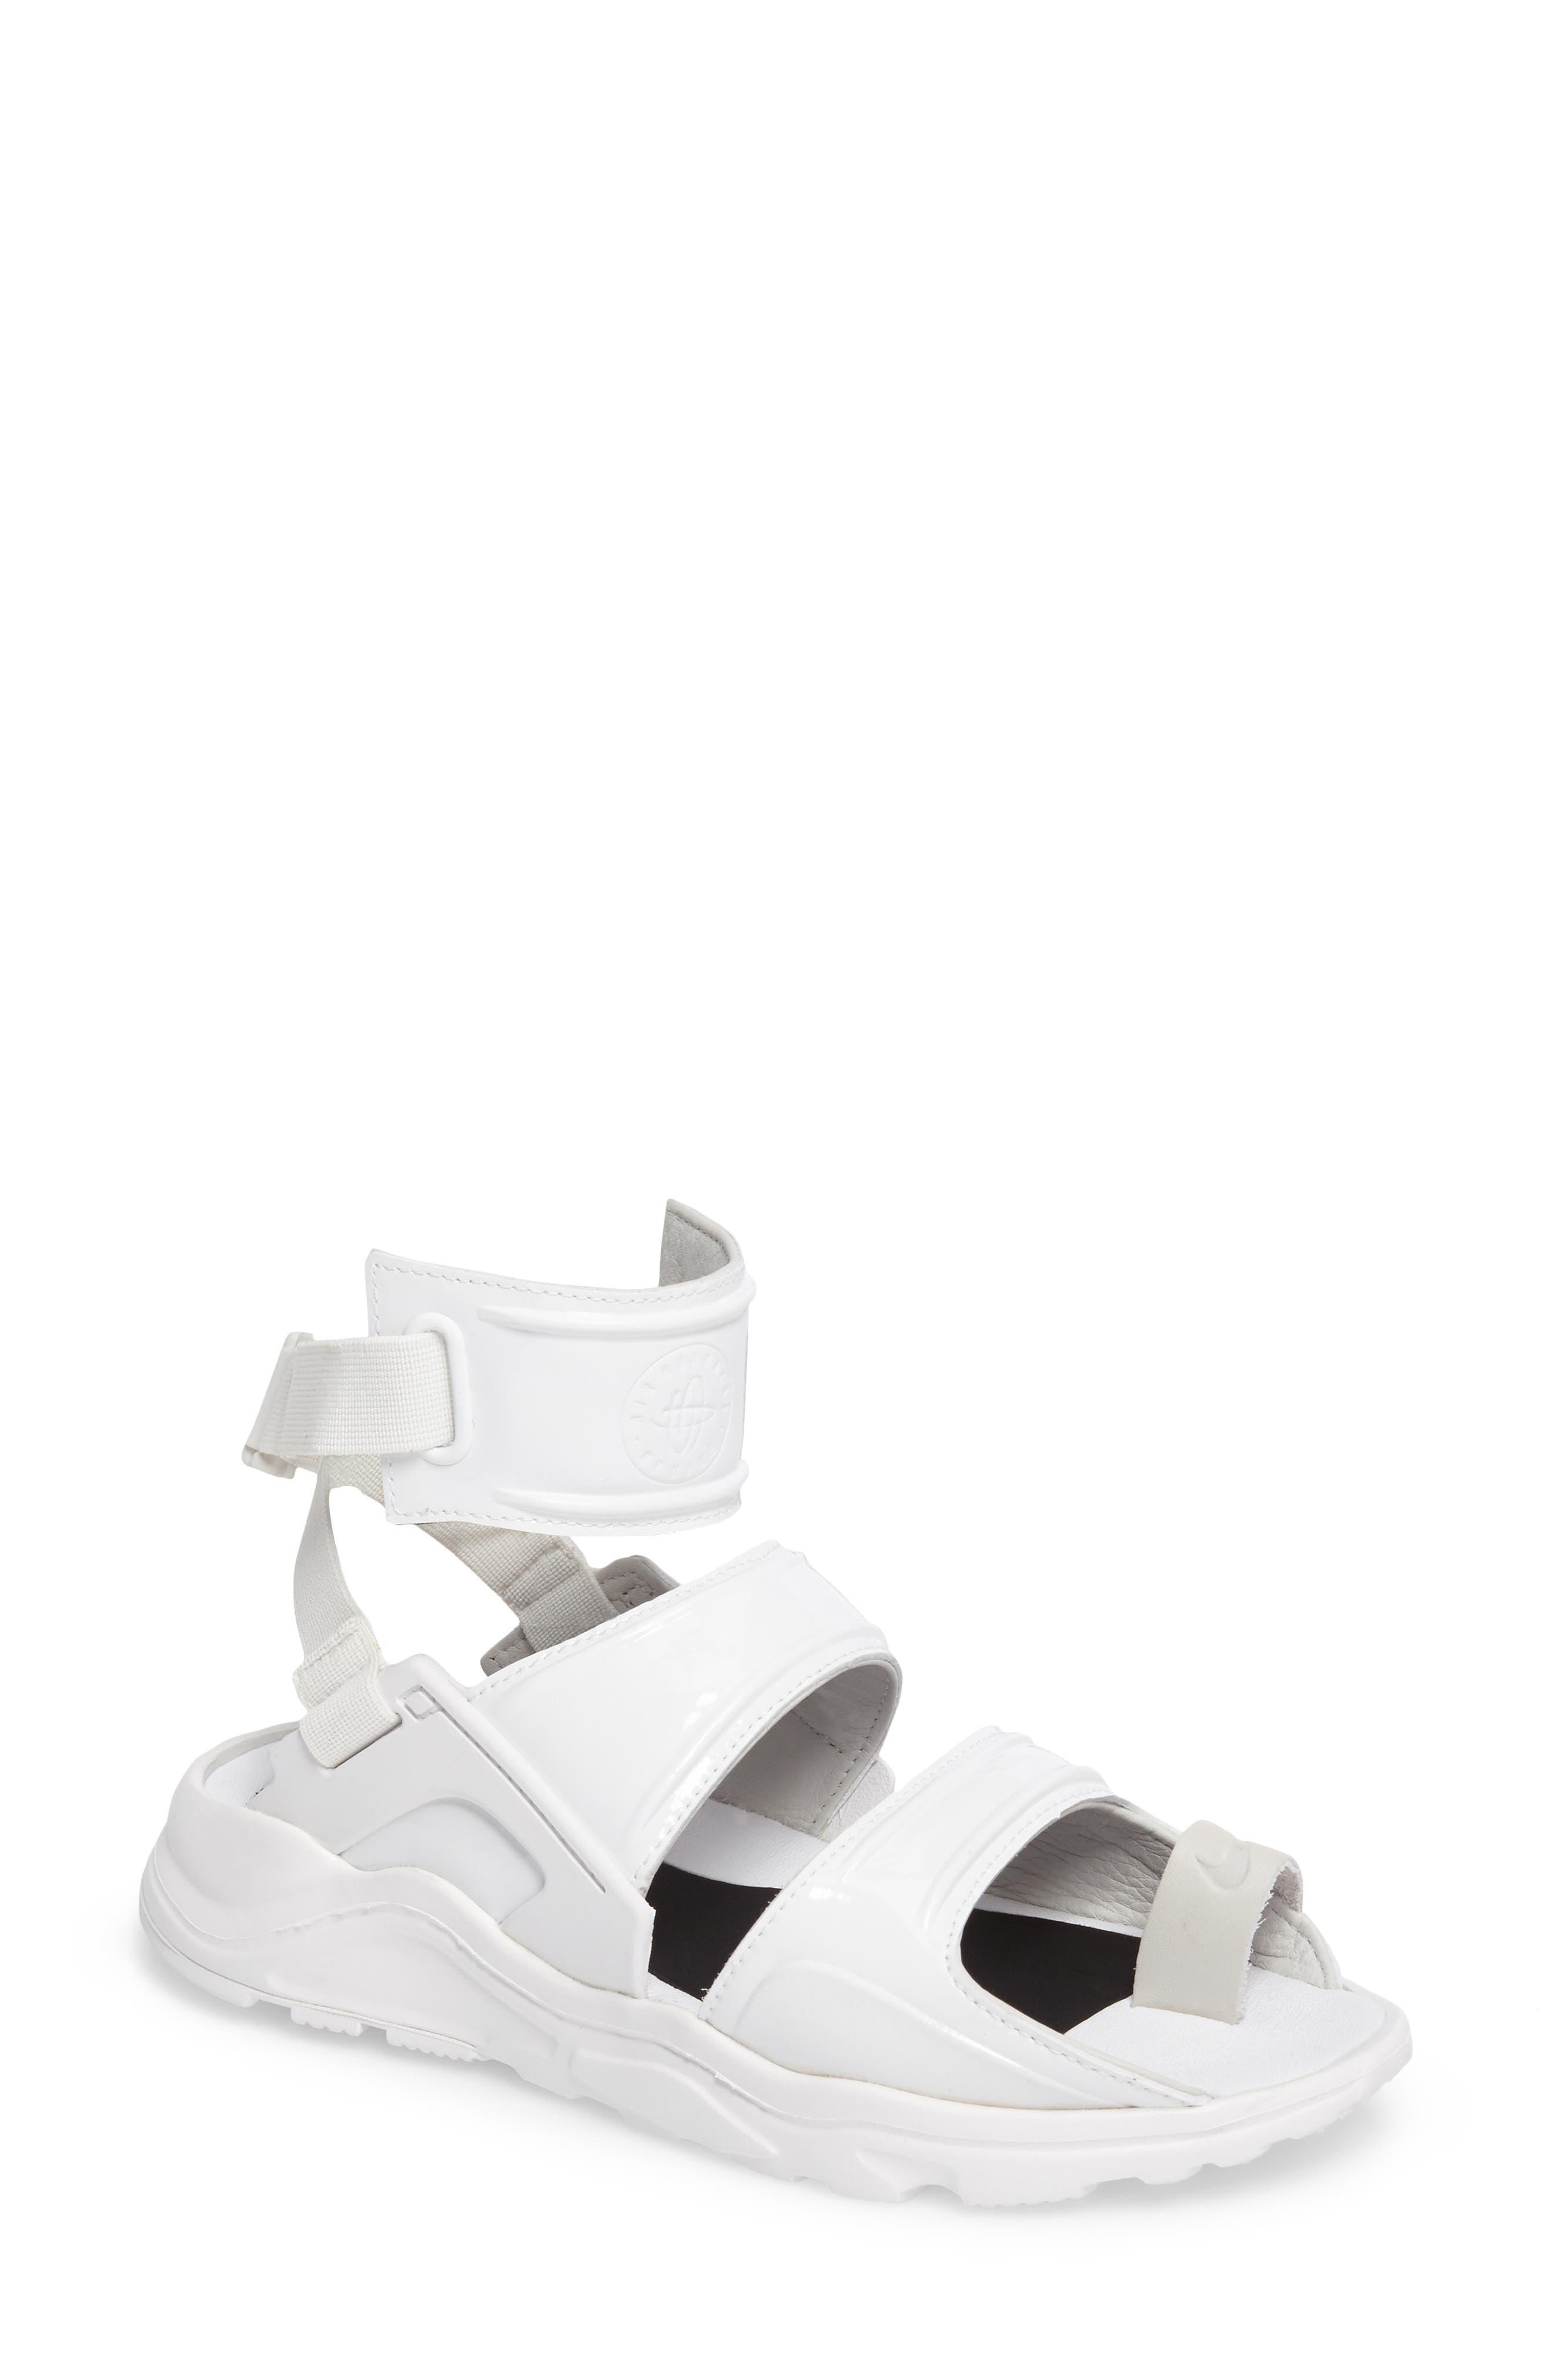 Alternate Image 1 Selected - Nike Air Huarache Gladiator Sandal (Women)